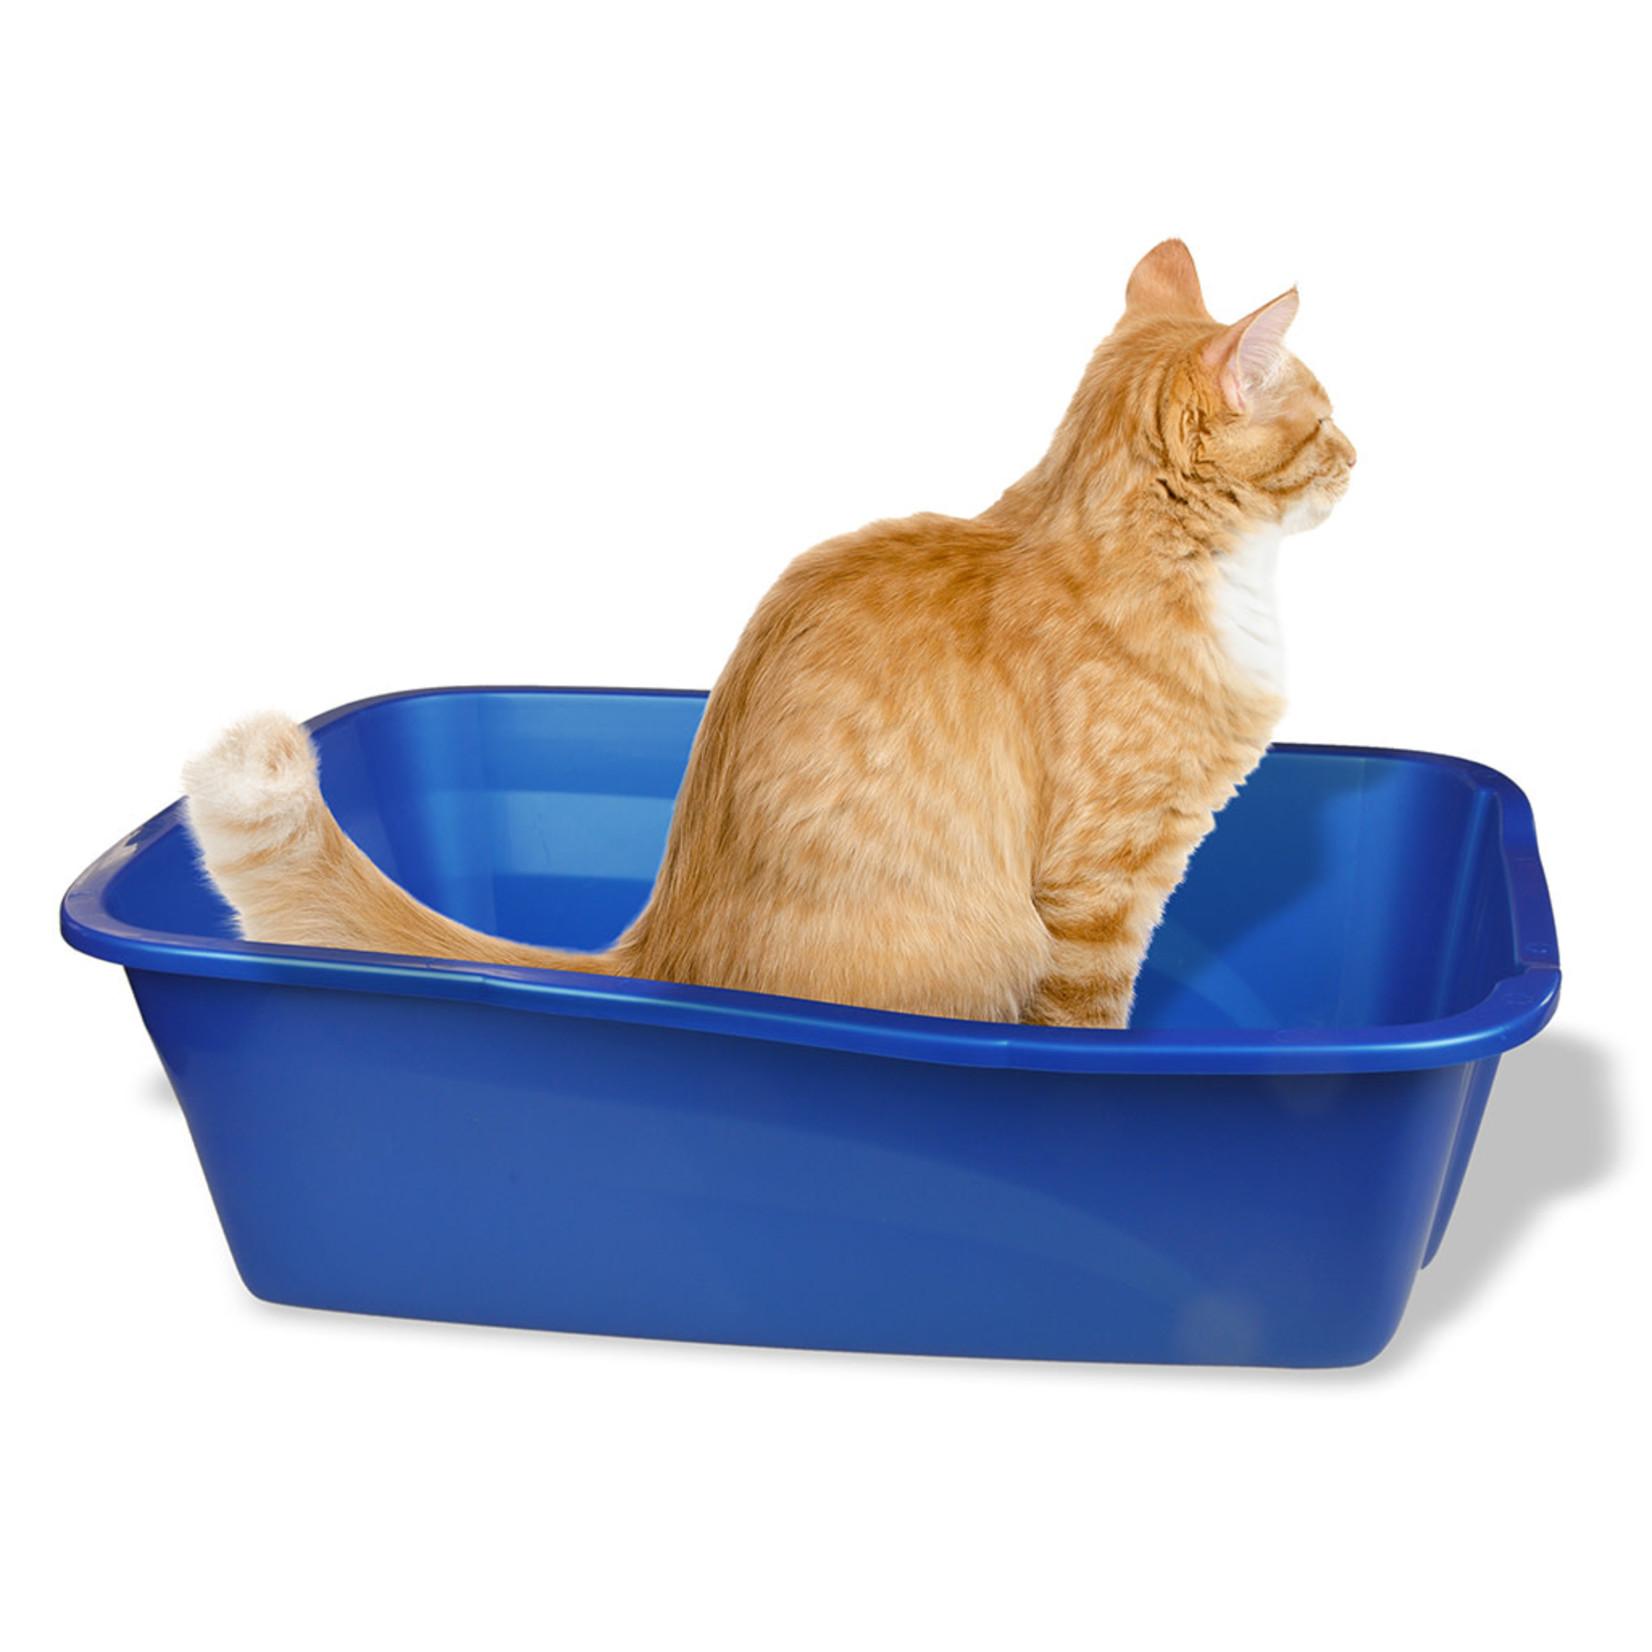 Van Ness cat litter box Xlarge 22x16x6.5